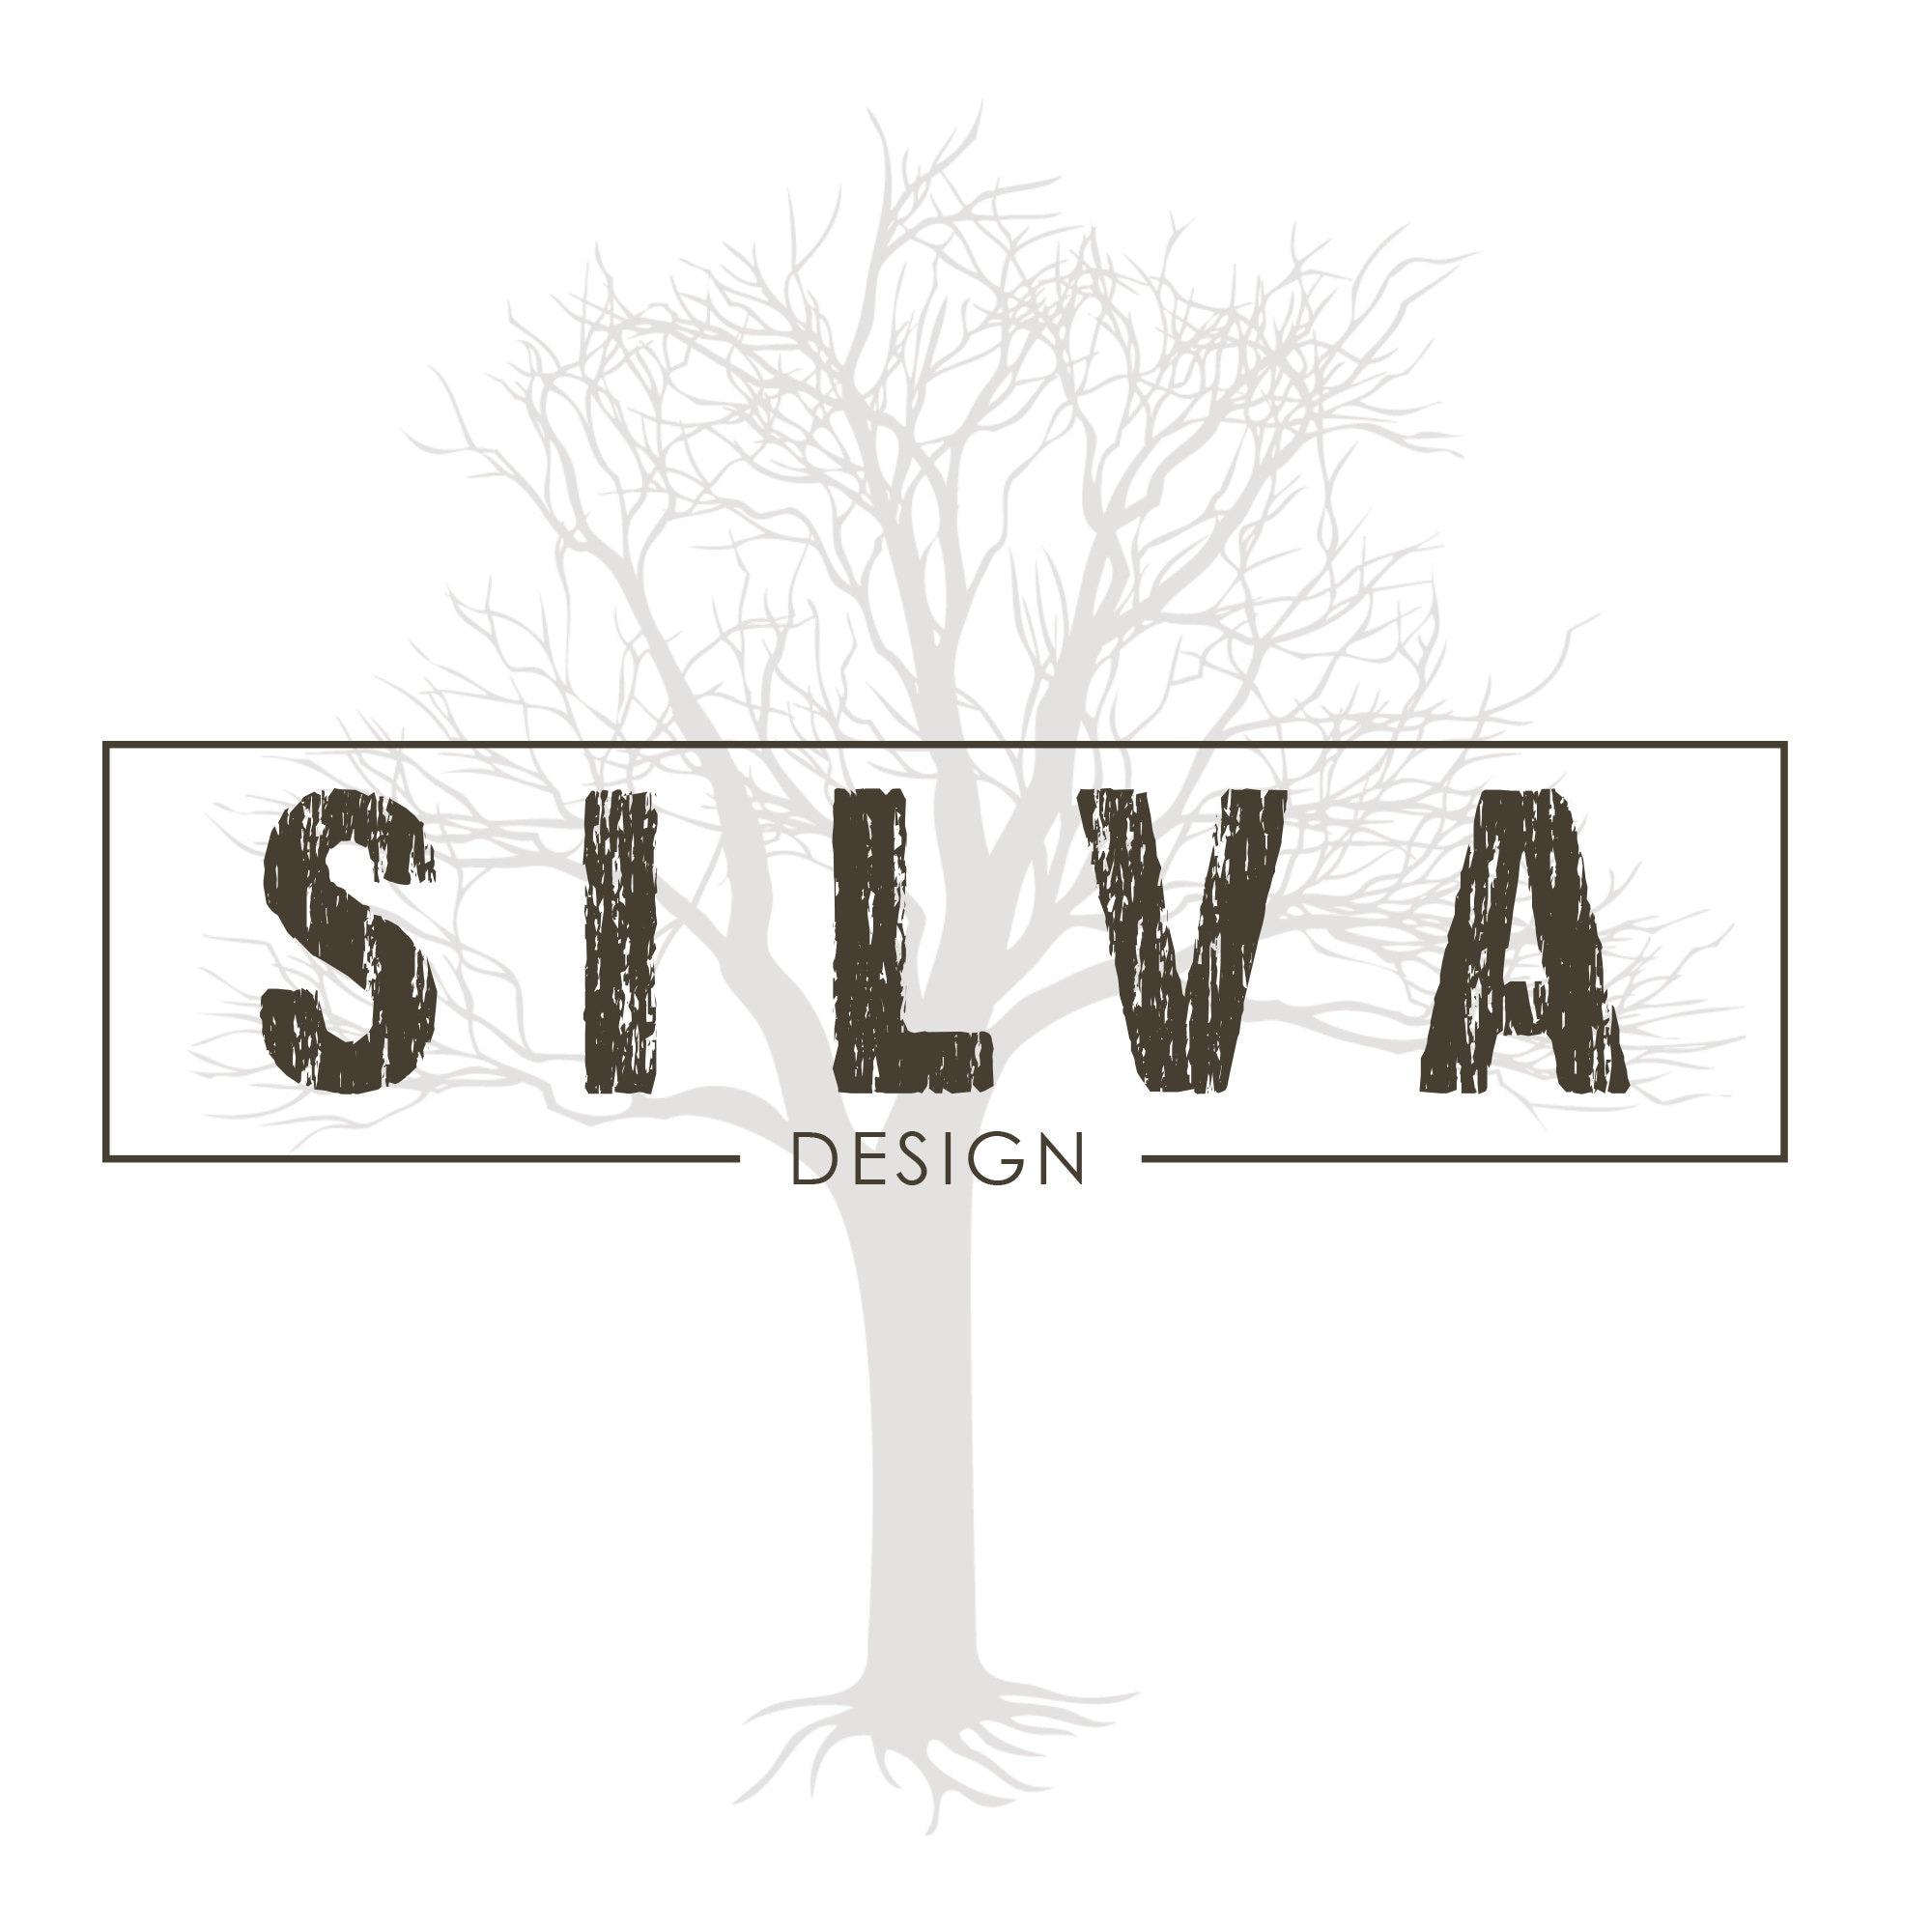 SilvaDesignLLC